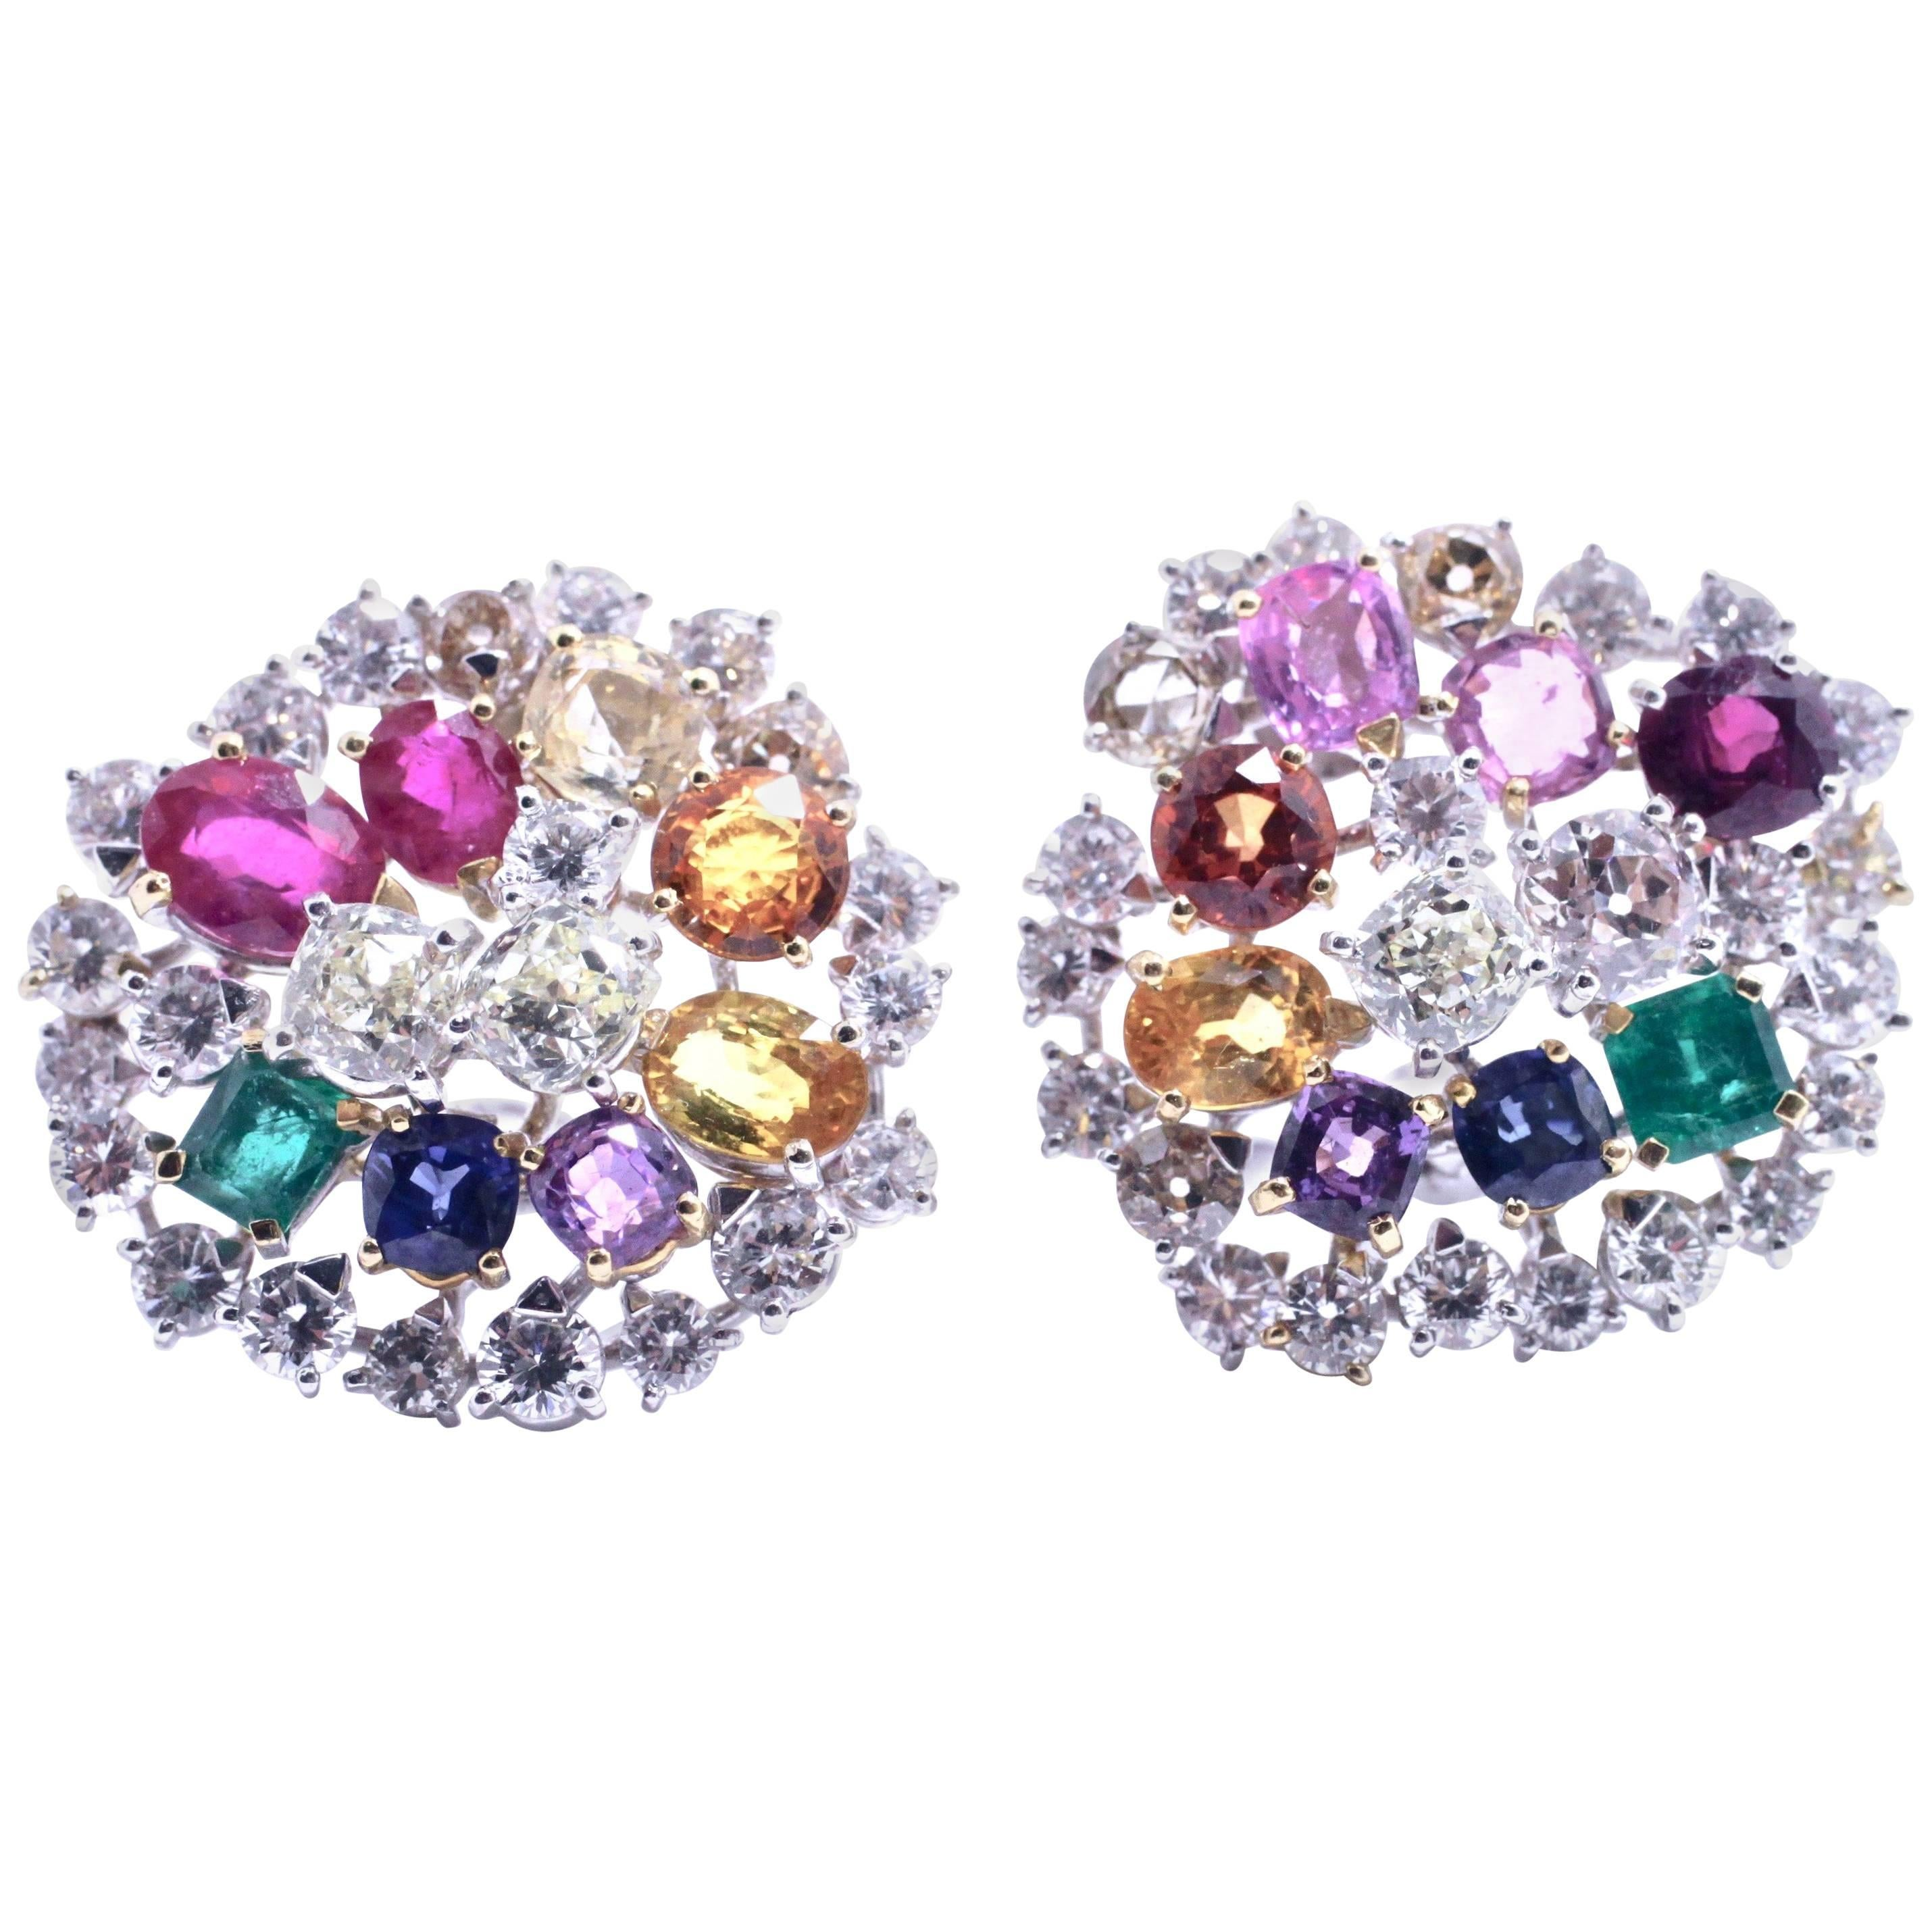 Diamonds Ruby Emerald Sapphire 18 kt. White Gold Cluster Earrings